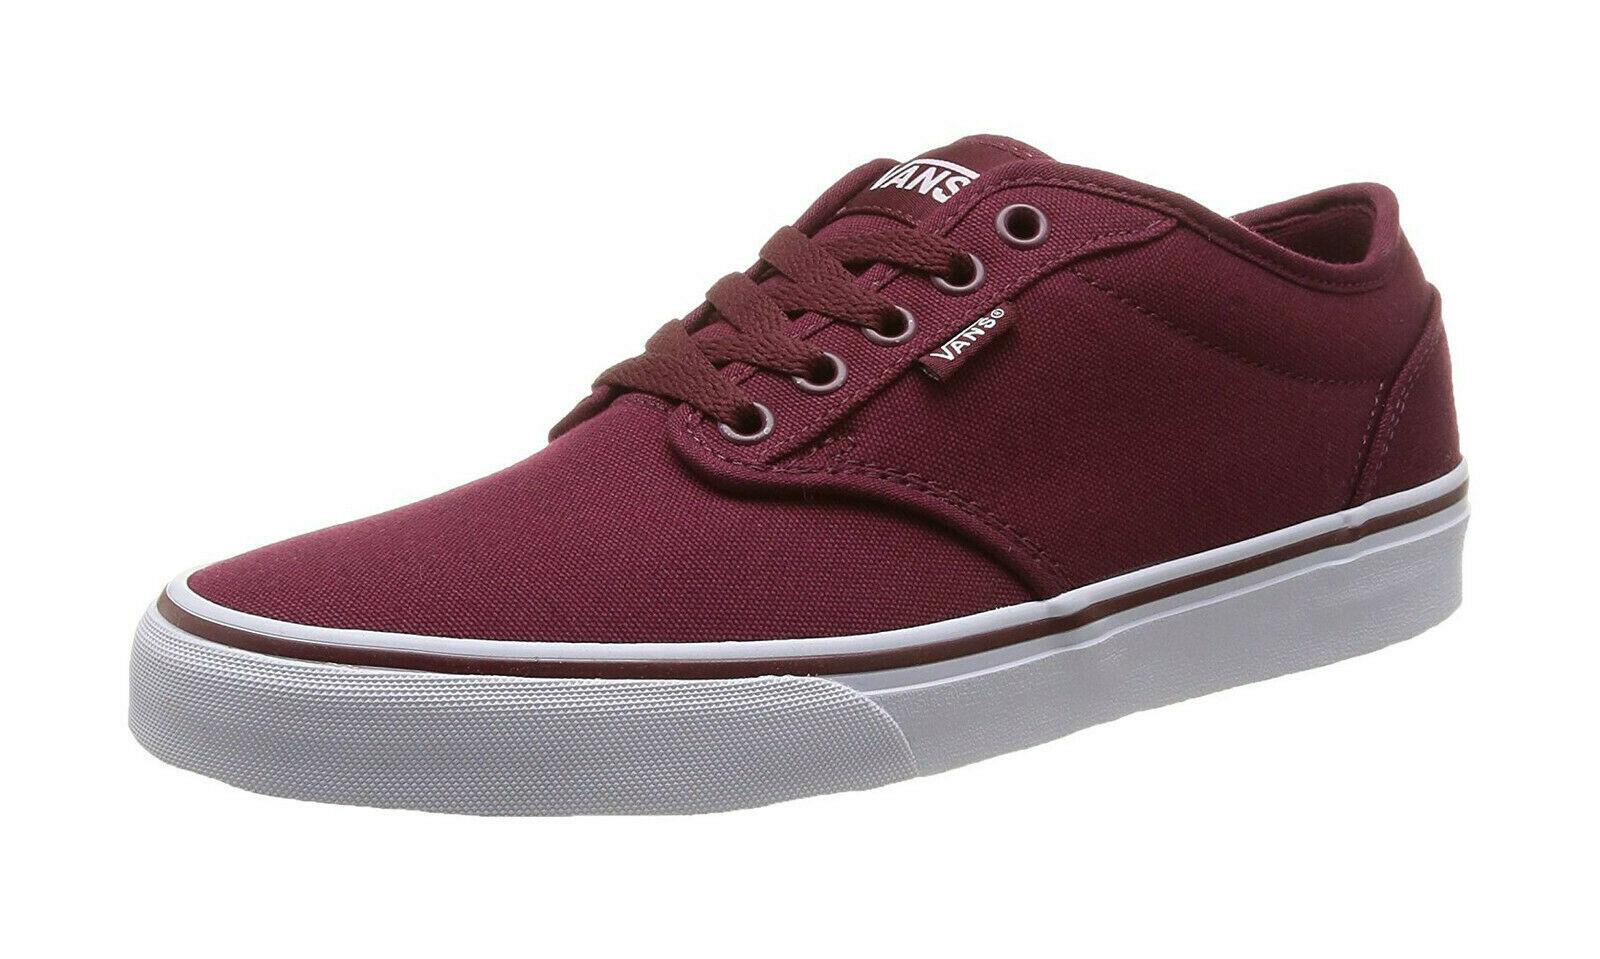 01ef888d44637 Vans Men Shoes Atwood Canvas Sneakers Windsor Wine Burgundy Cardinal Red